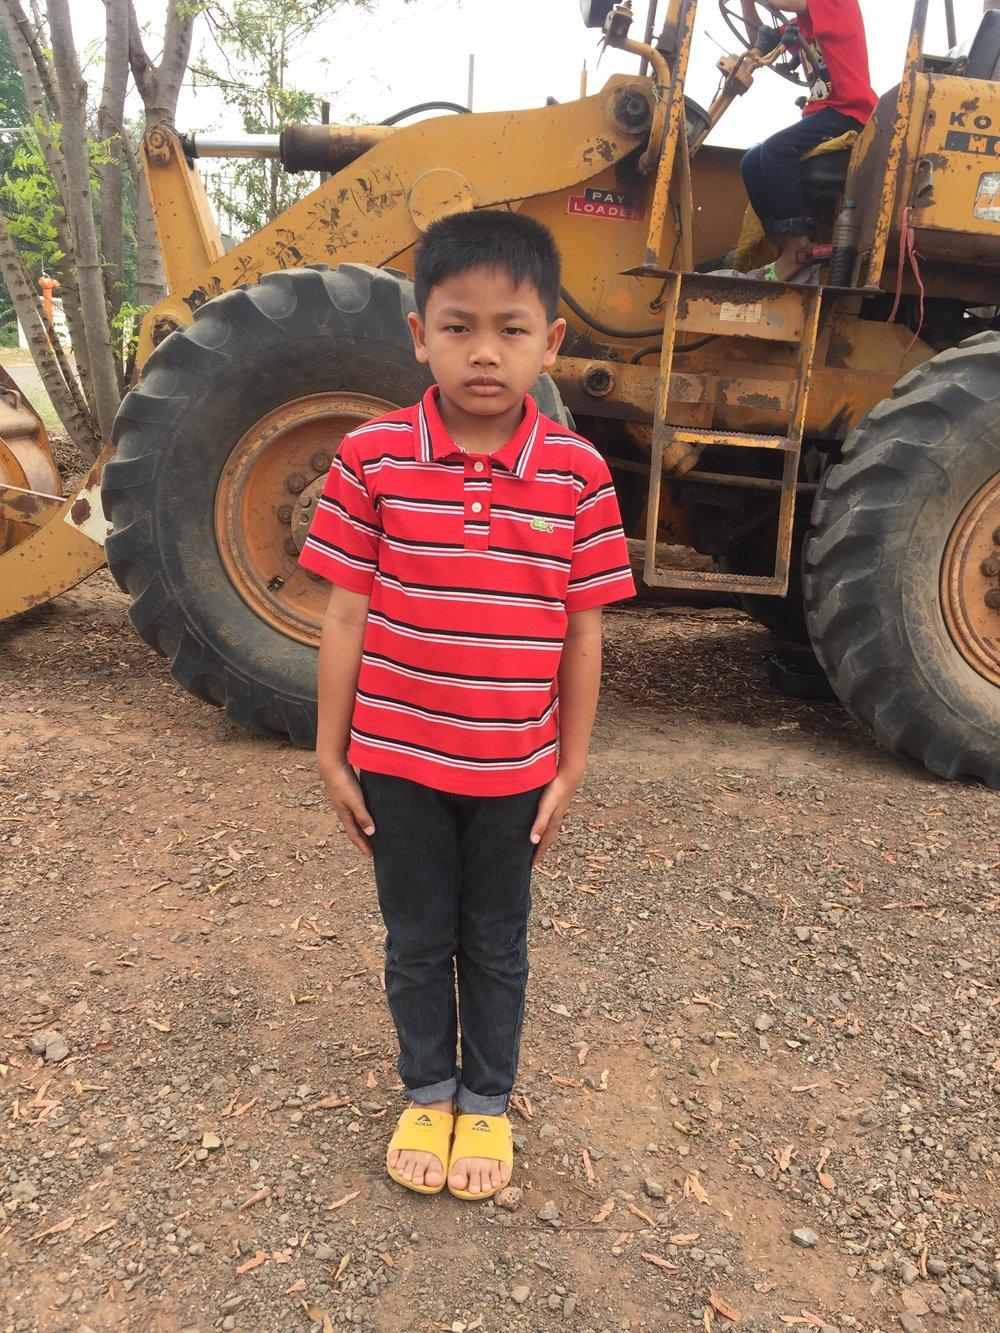 Nawin Sischompu (Kita) (7 years old, boy)